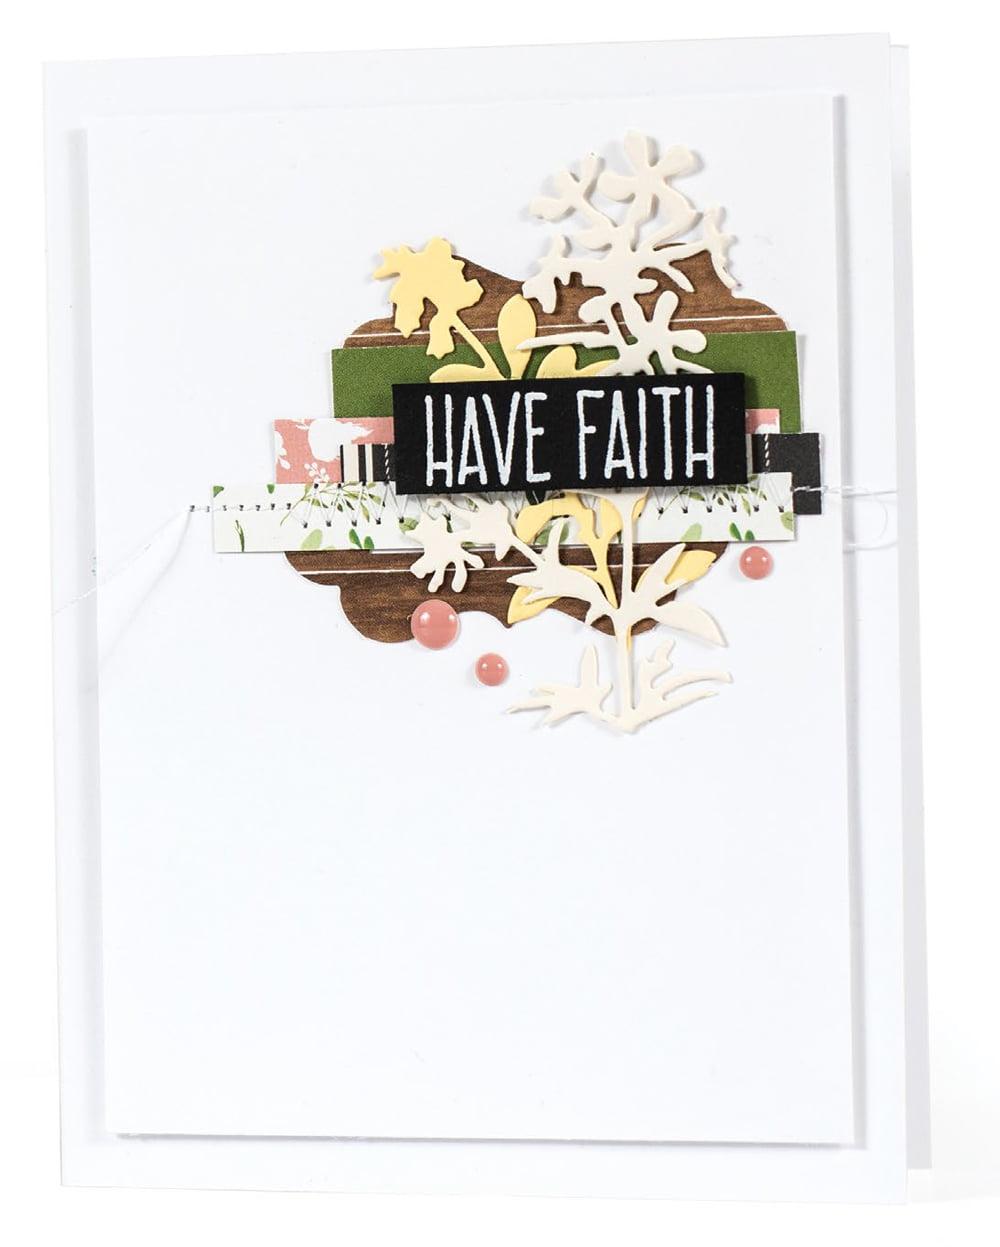 SCT Summer 2018 - Have Faith card by Miriam Prantner